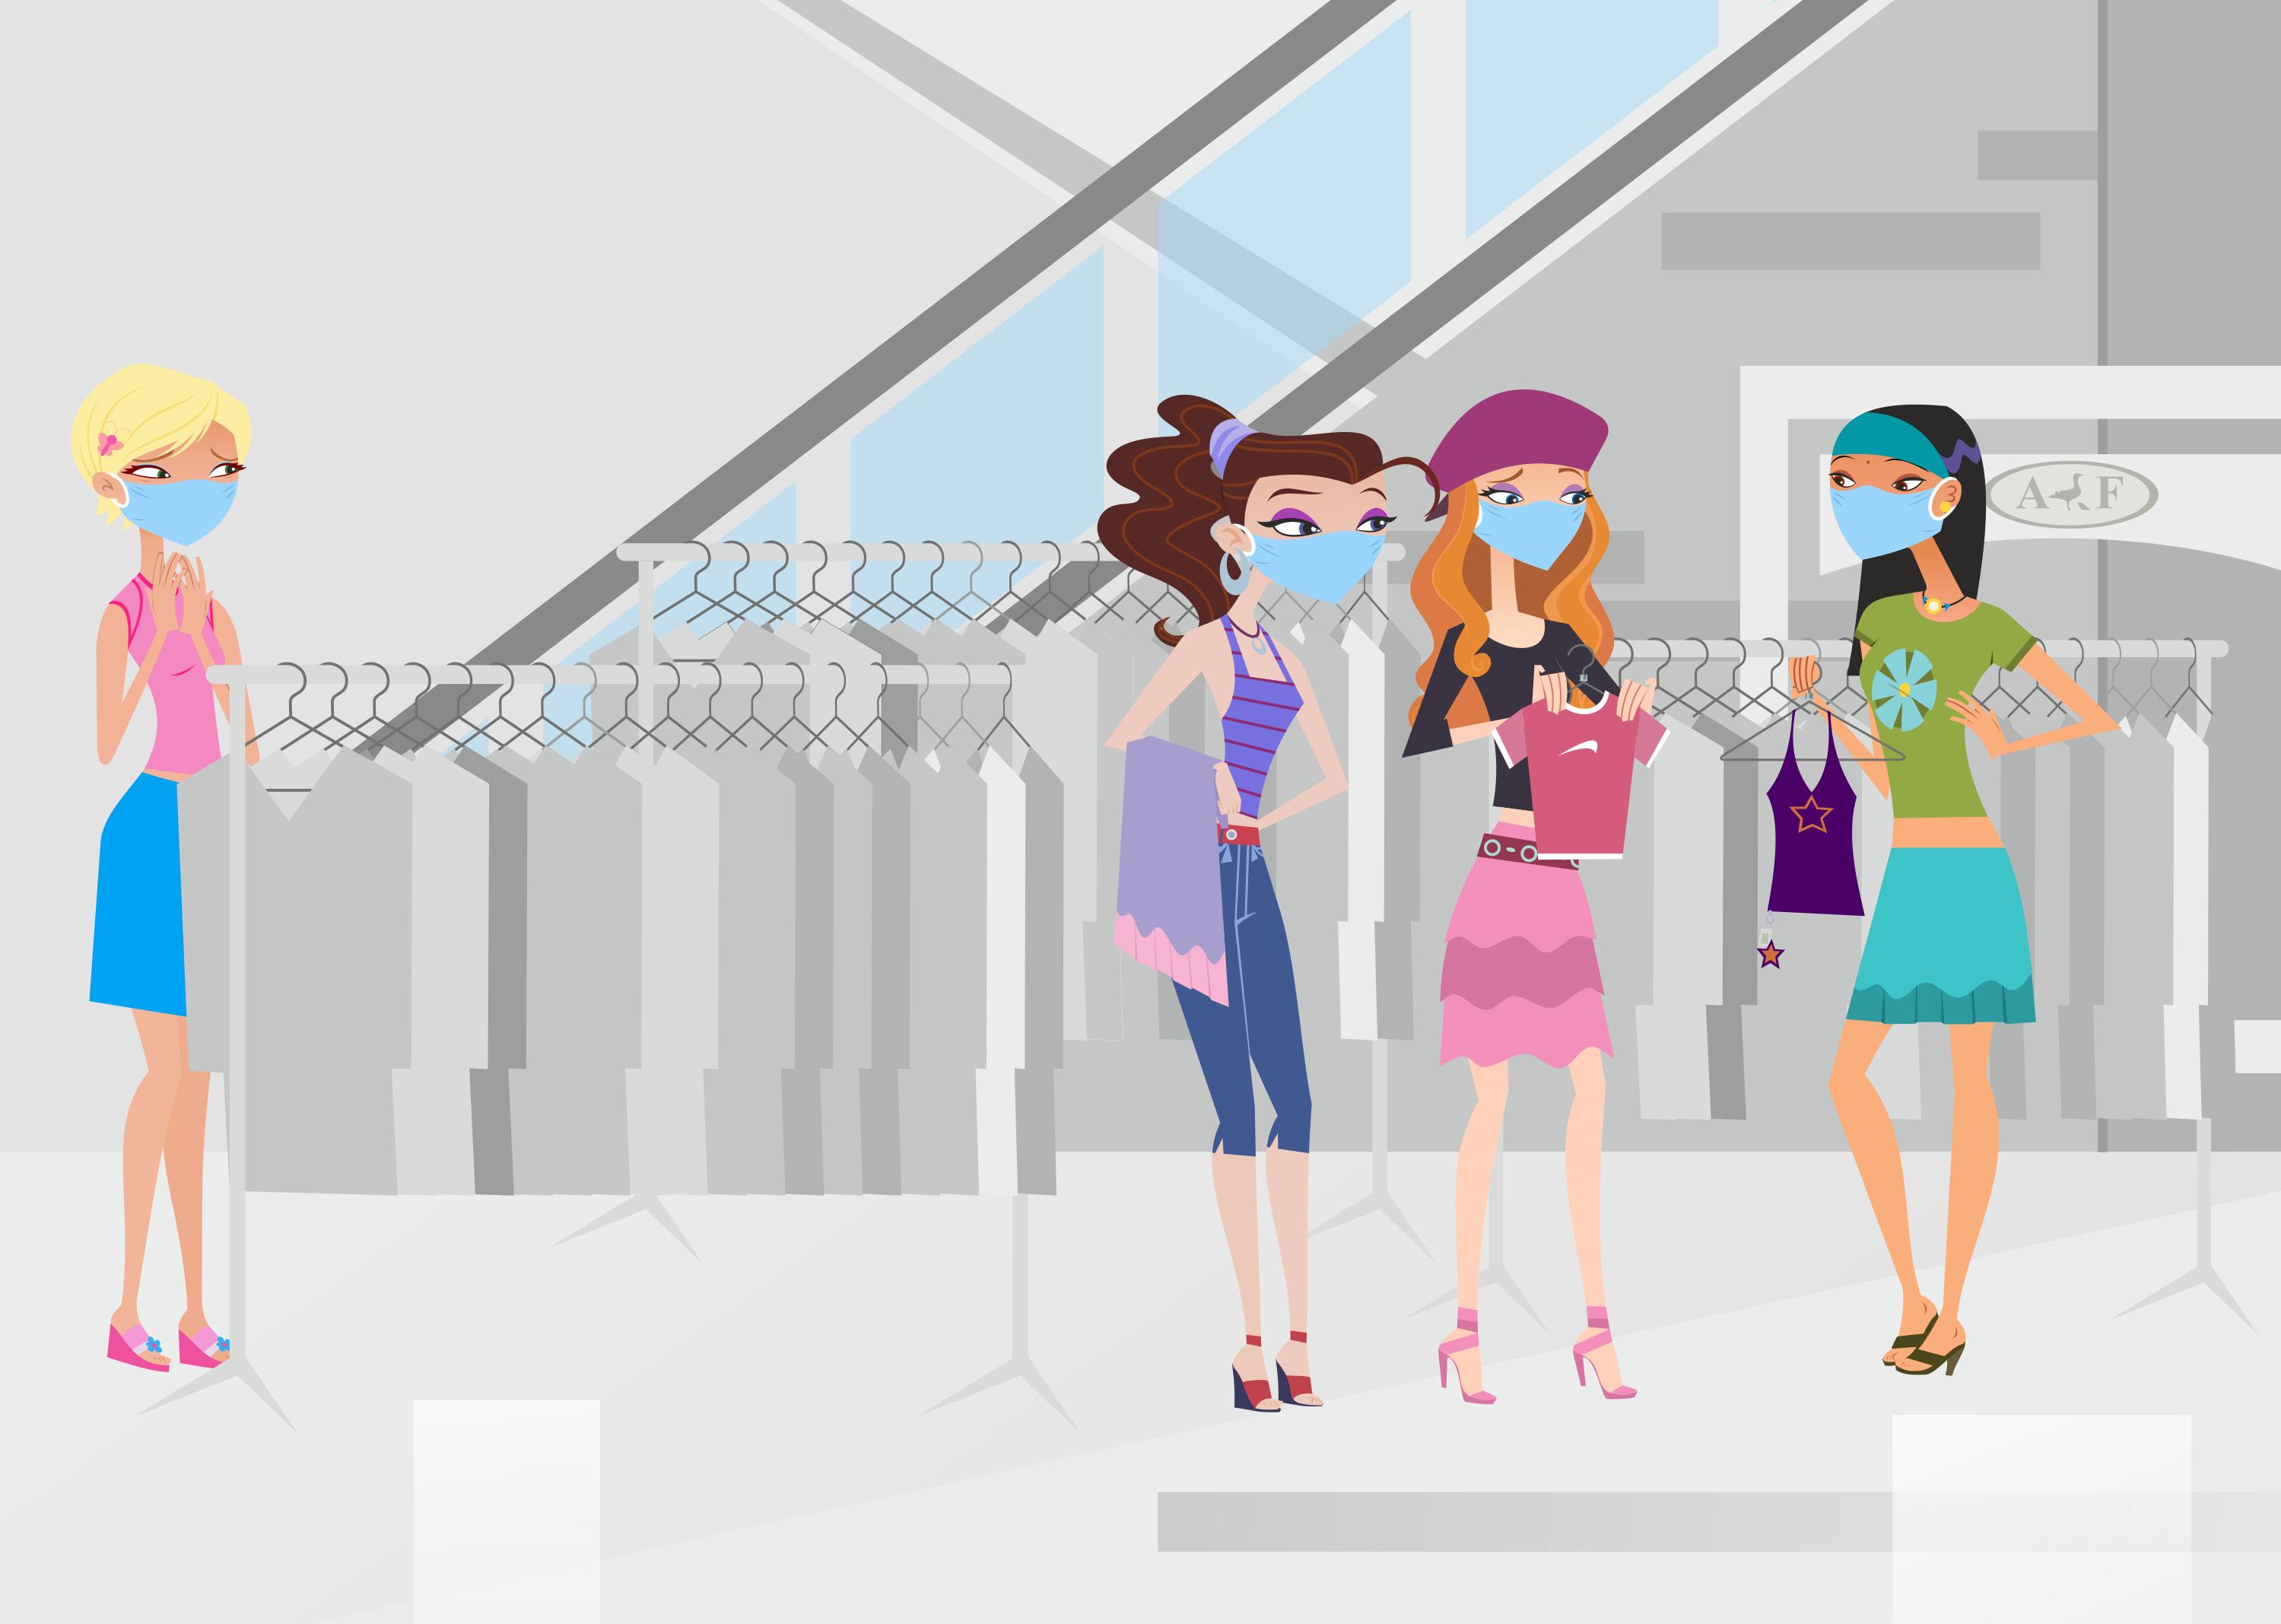 6teen: Tricia, Gwen, and Mandy by Juliefan21 on DeviantArt